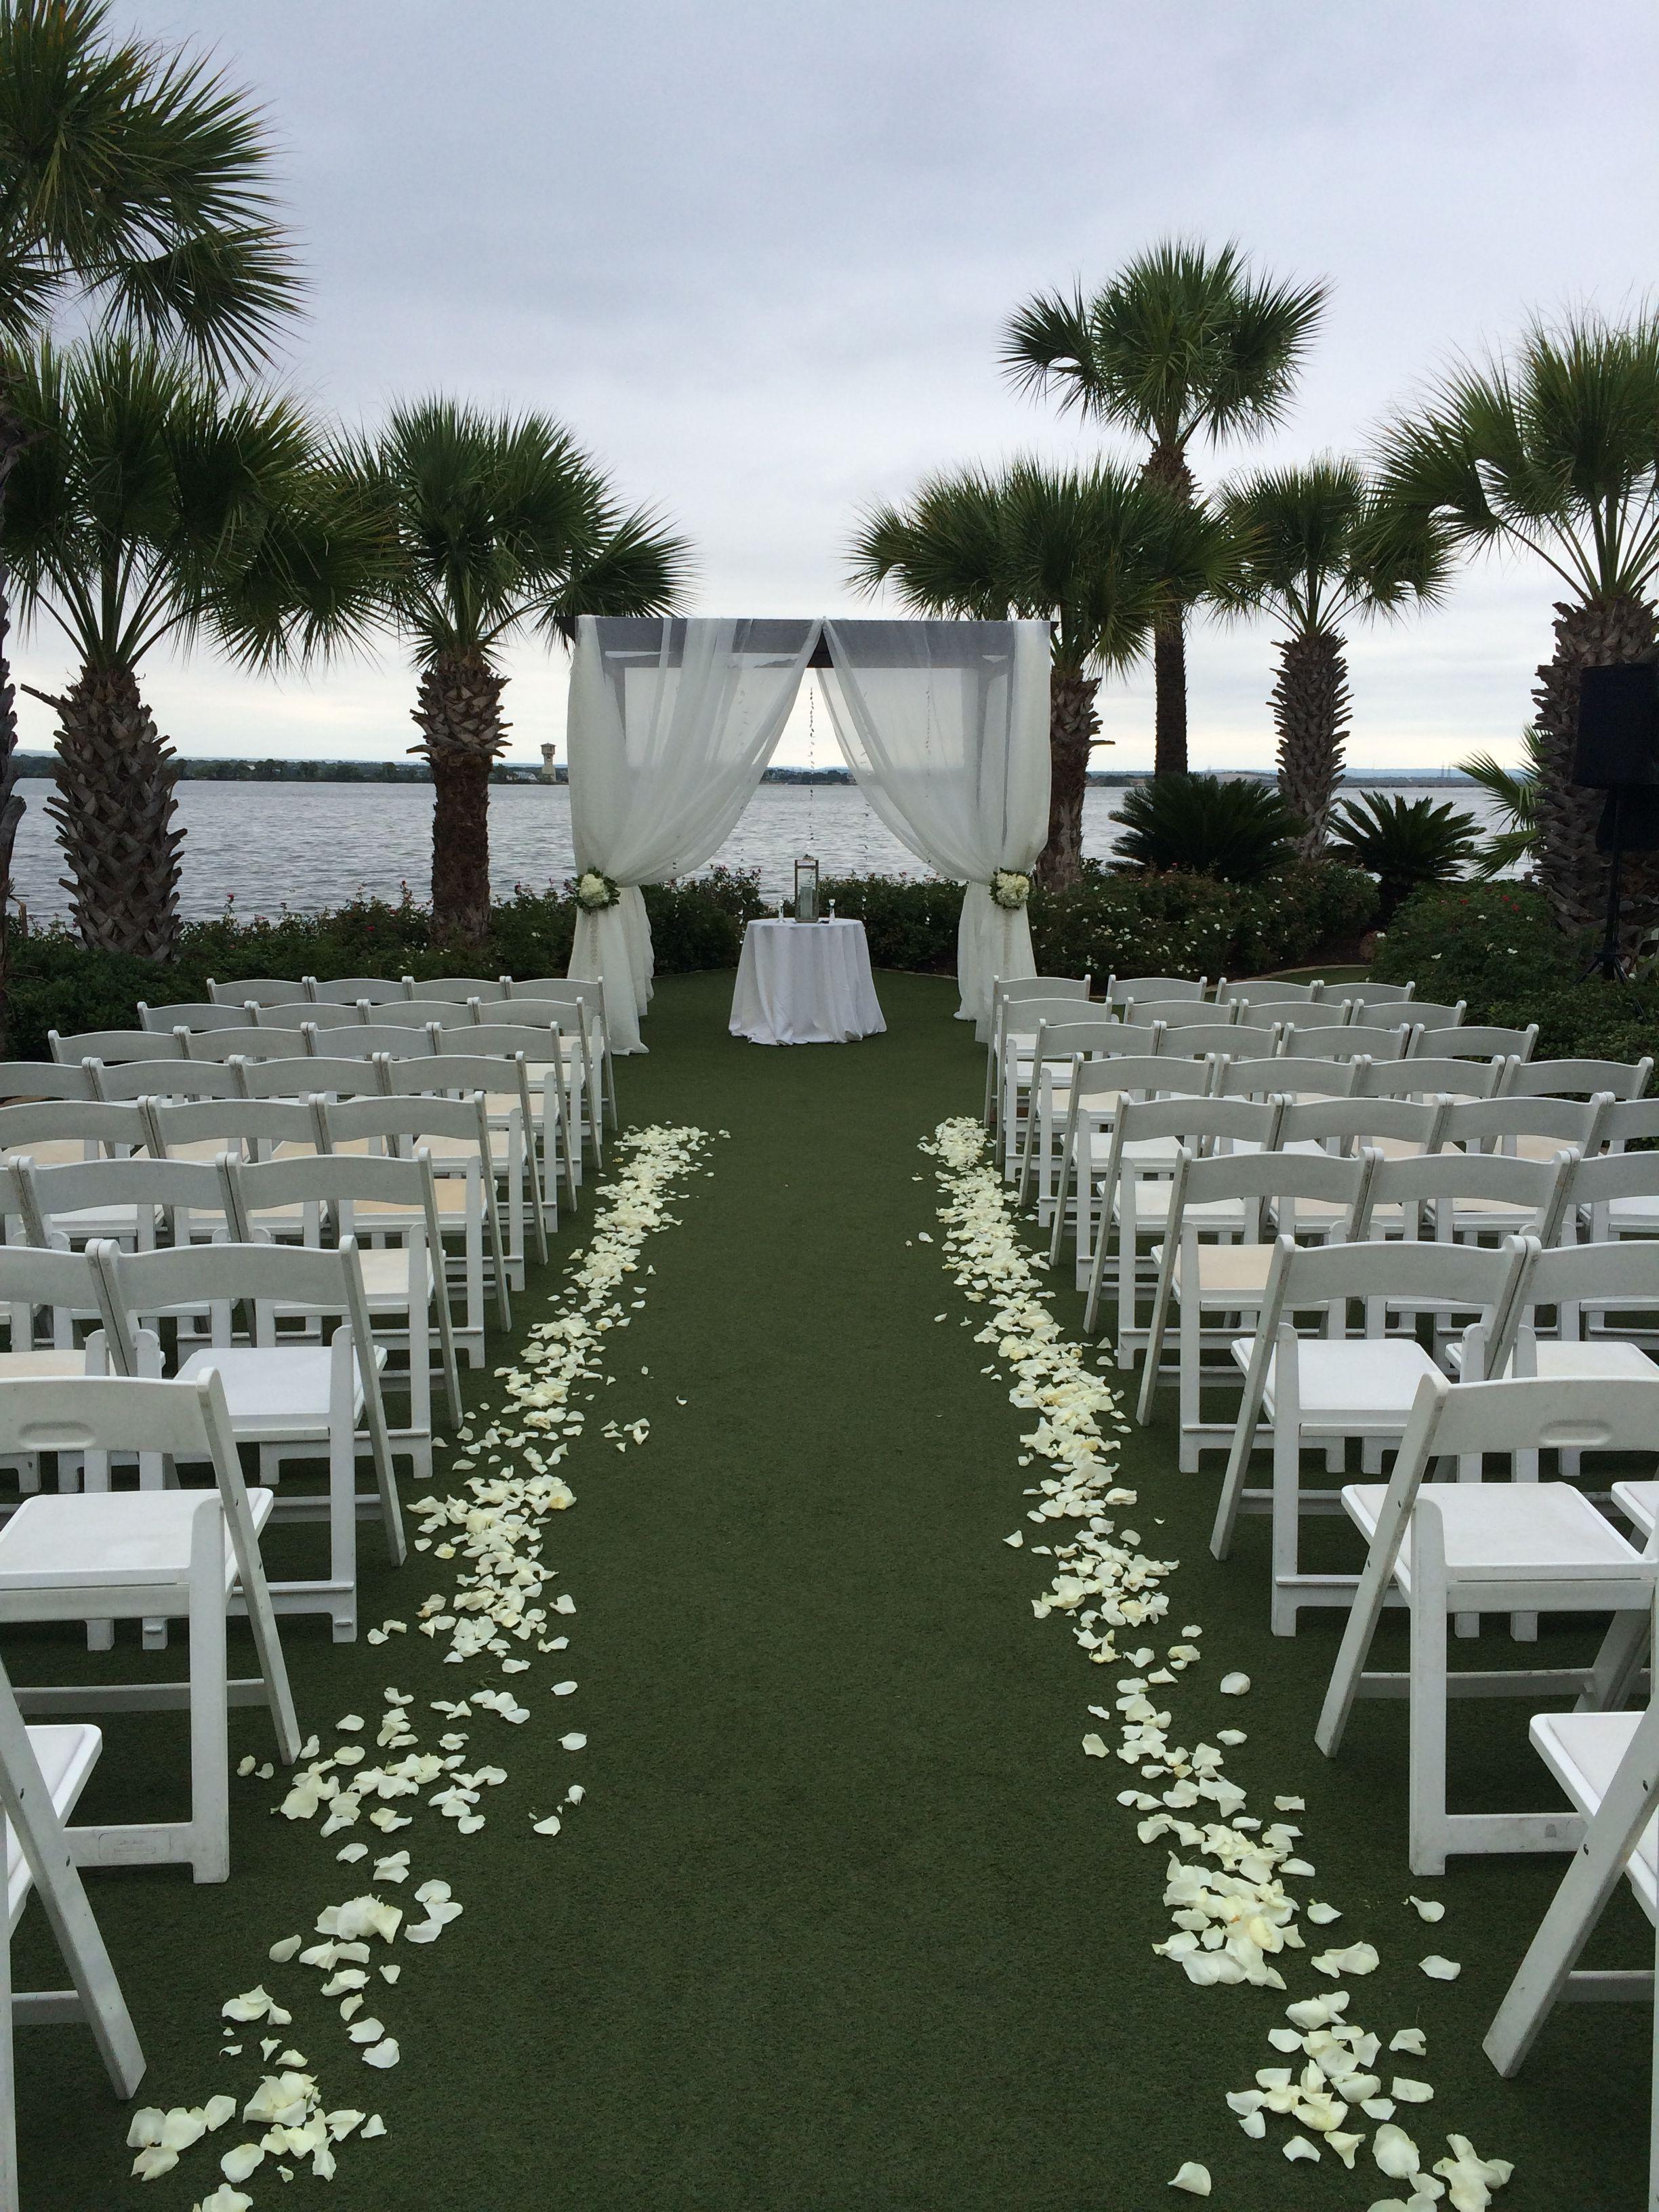 Magnolia Lawn Wedding Flowers Resort Wedding Horseshoe Bay Resort